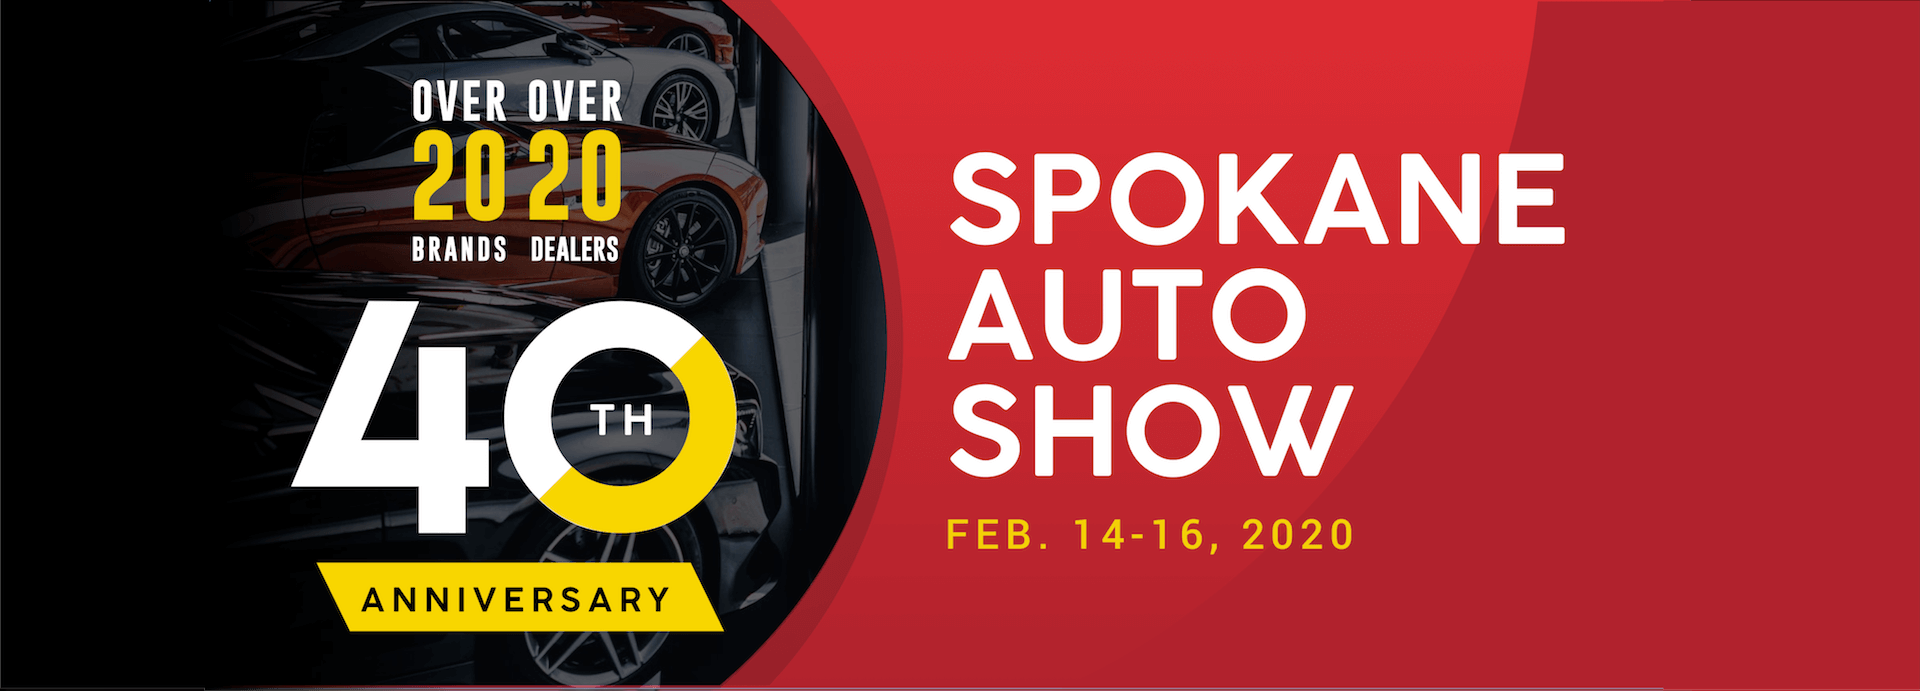 Spokane Auto Show 2020 Homepage Header